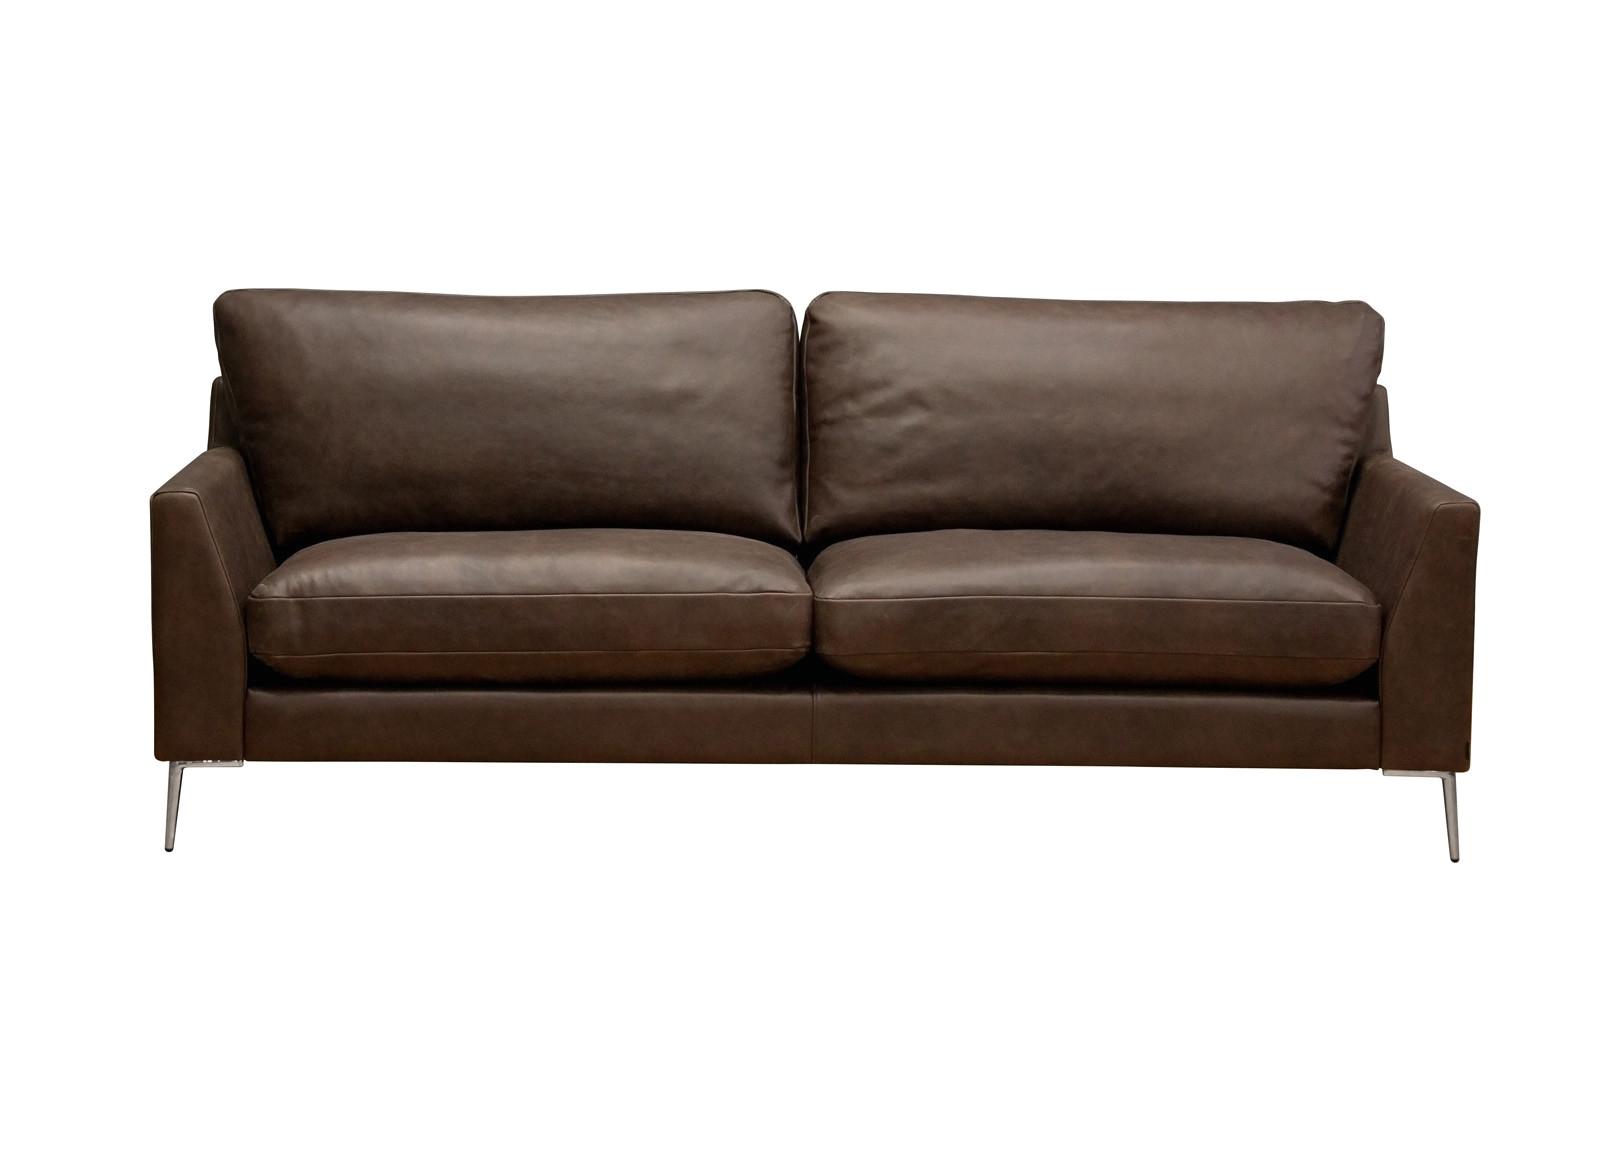 fold out twin bed chair best of arezzo sleeper sofa luxury modua owa cena od